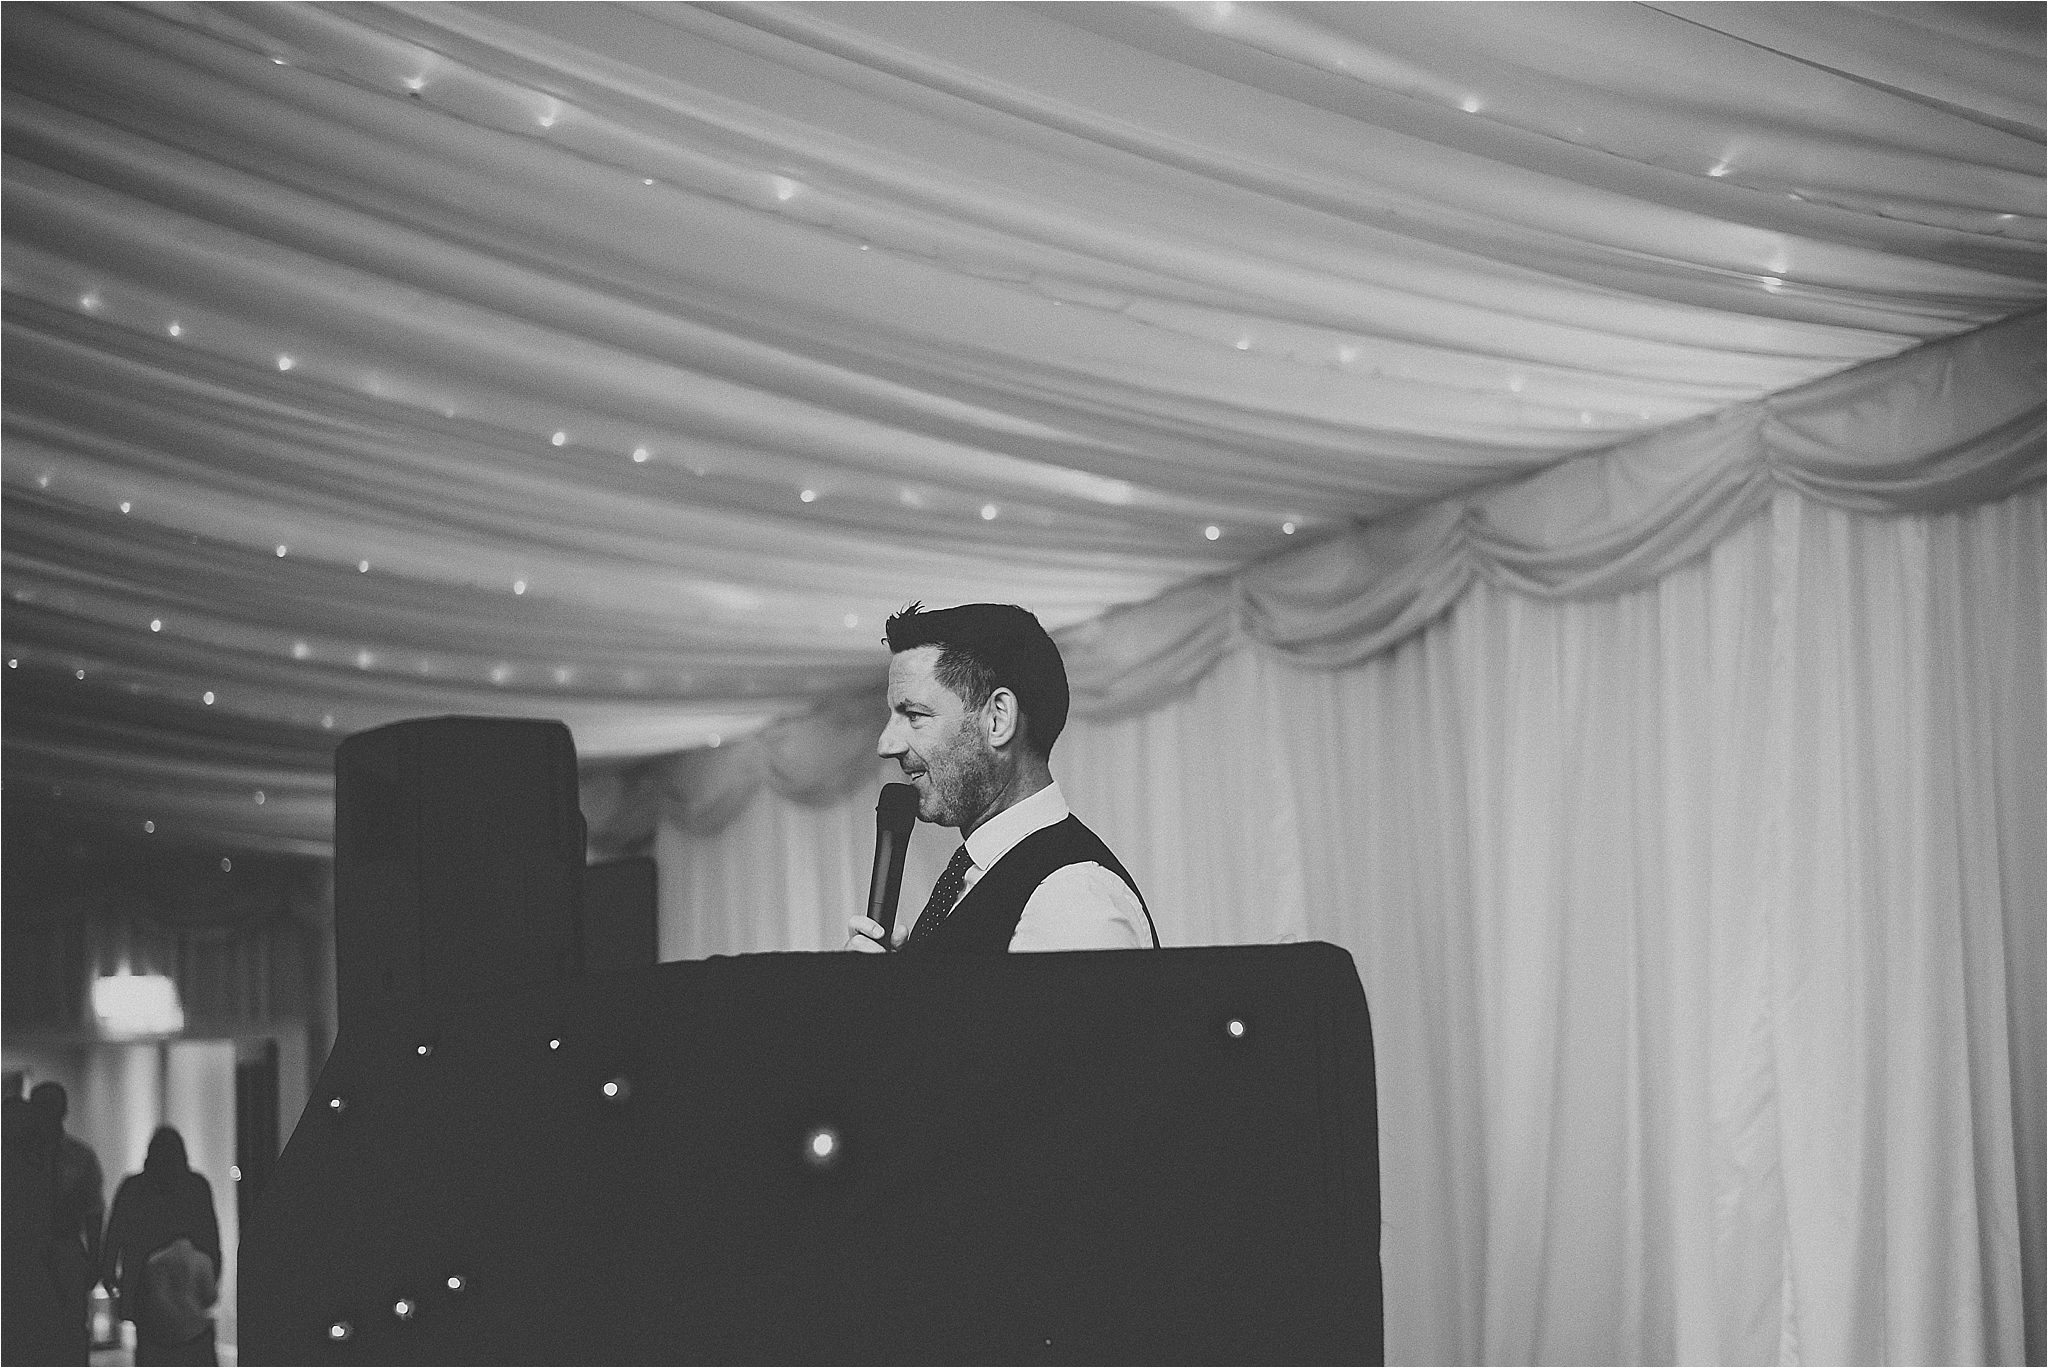 thevilla+lancashire+wreagreen+wedding+photographer76.jpg